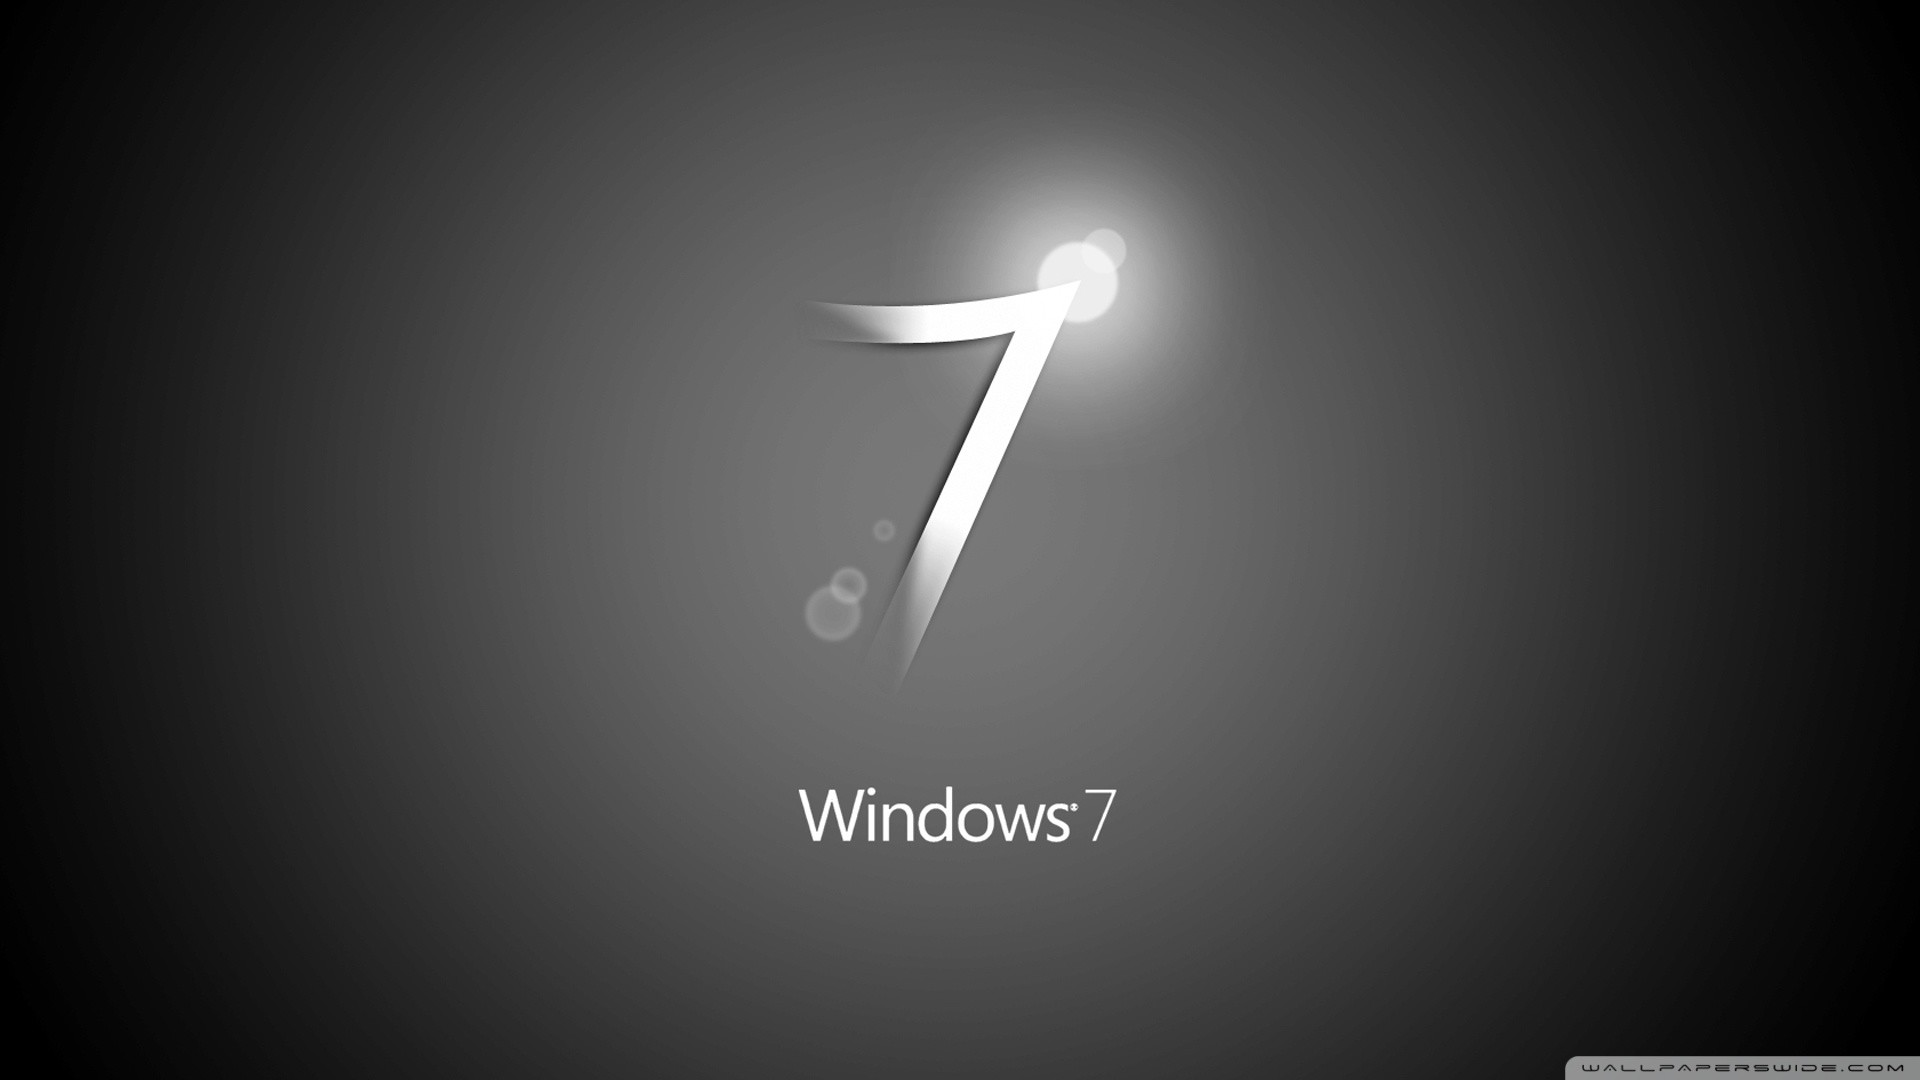 Windows 7 Background Is Black 62 Images